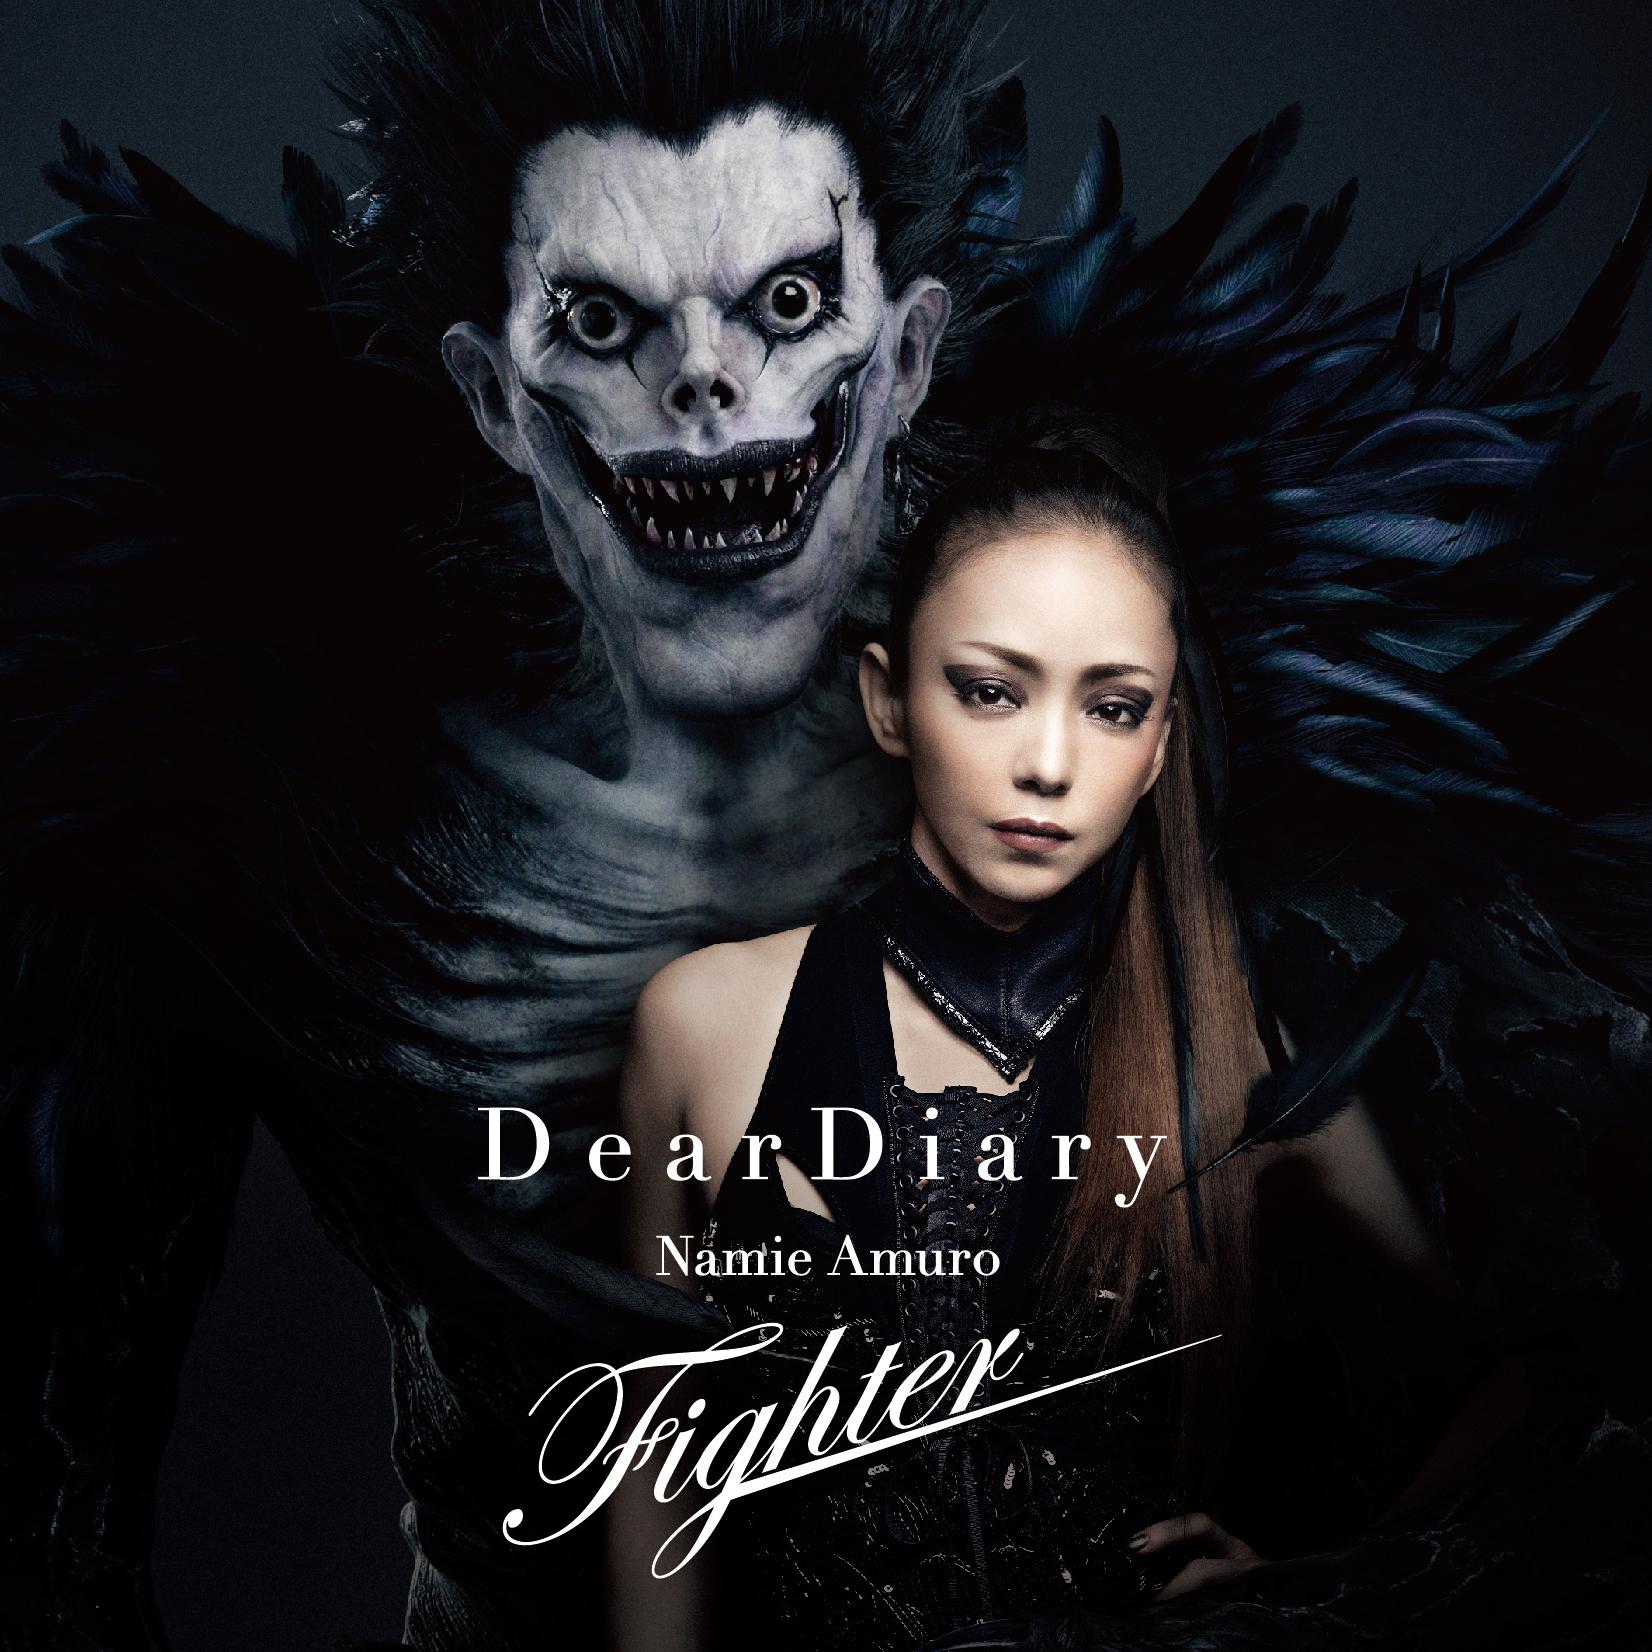 『Dear Diary / Fighter』CD ※初回限定盤、Instは収録されません